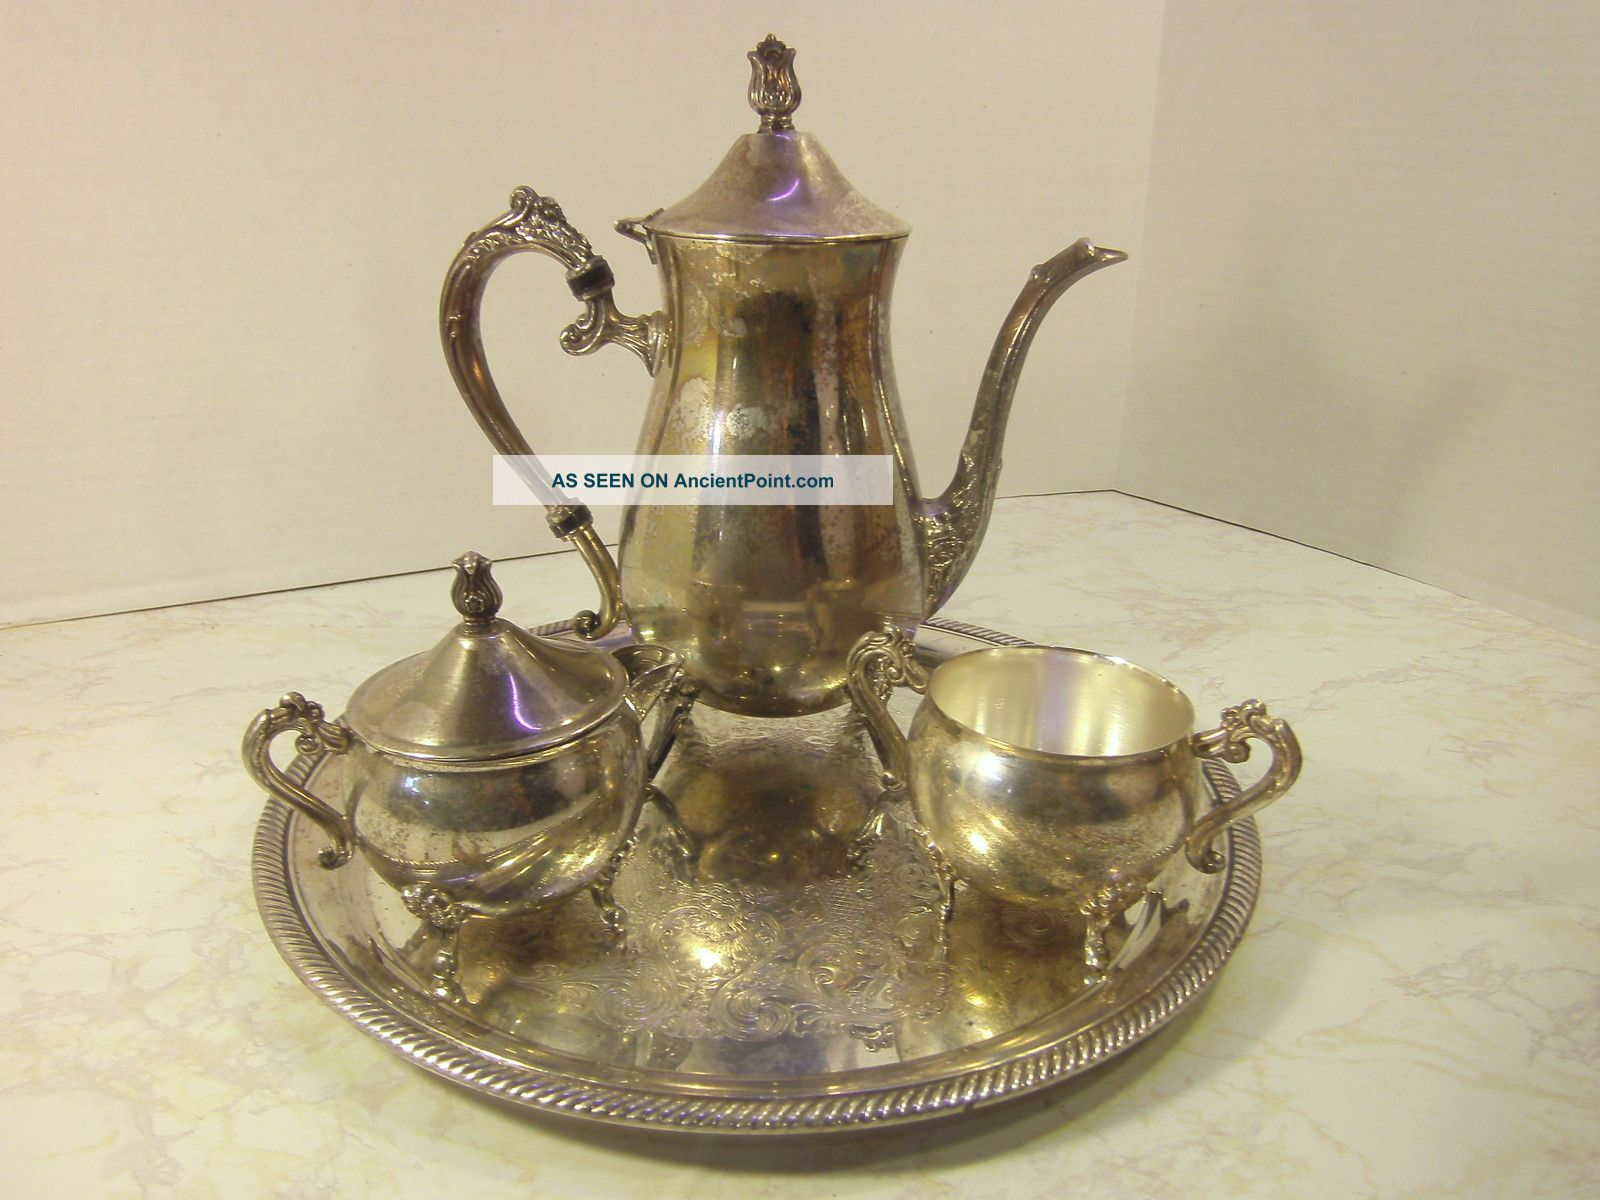 & Leonard Silver Plated Tea Set With Platter